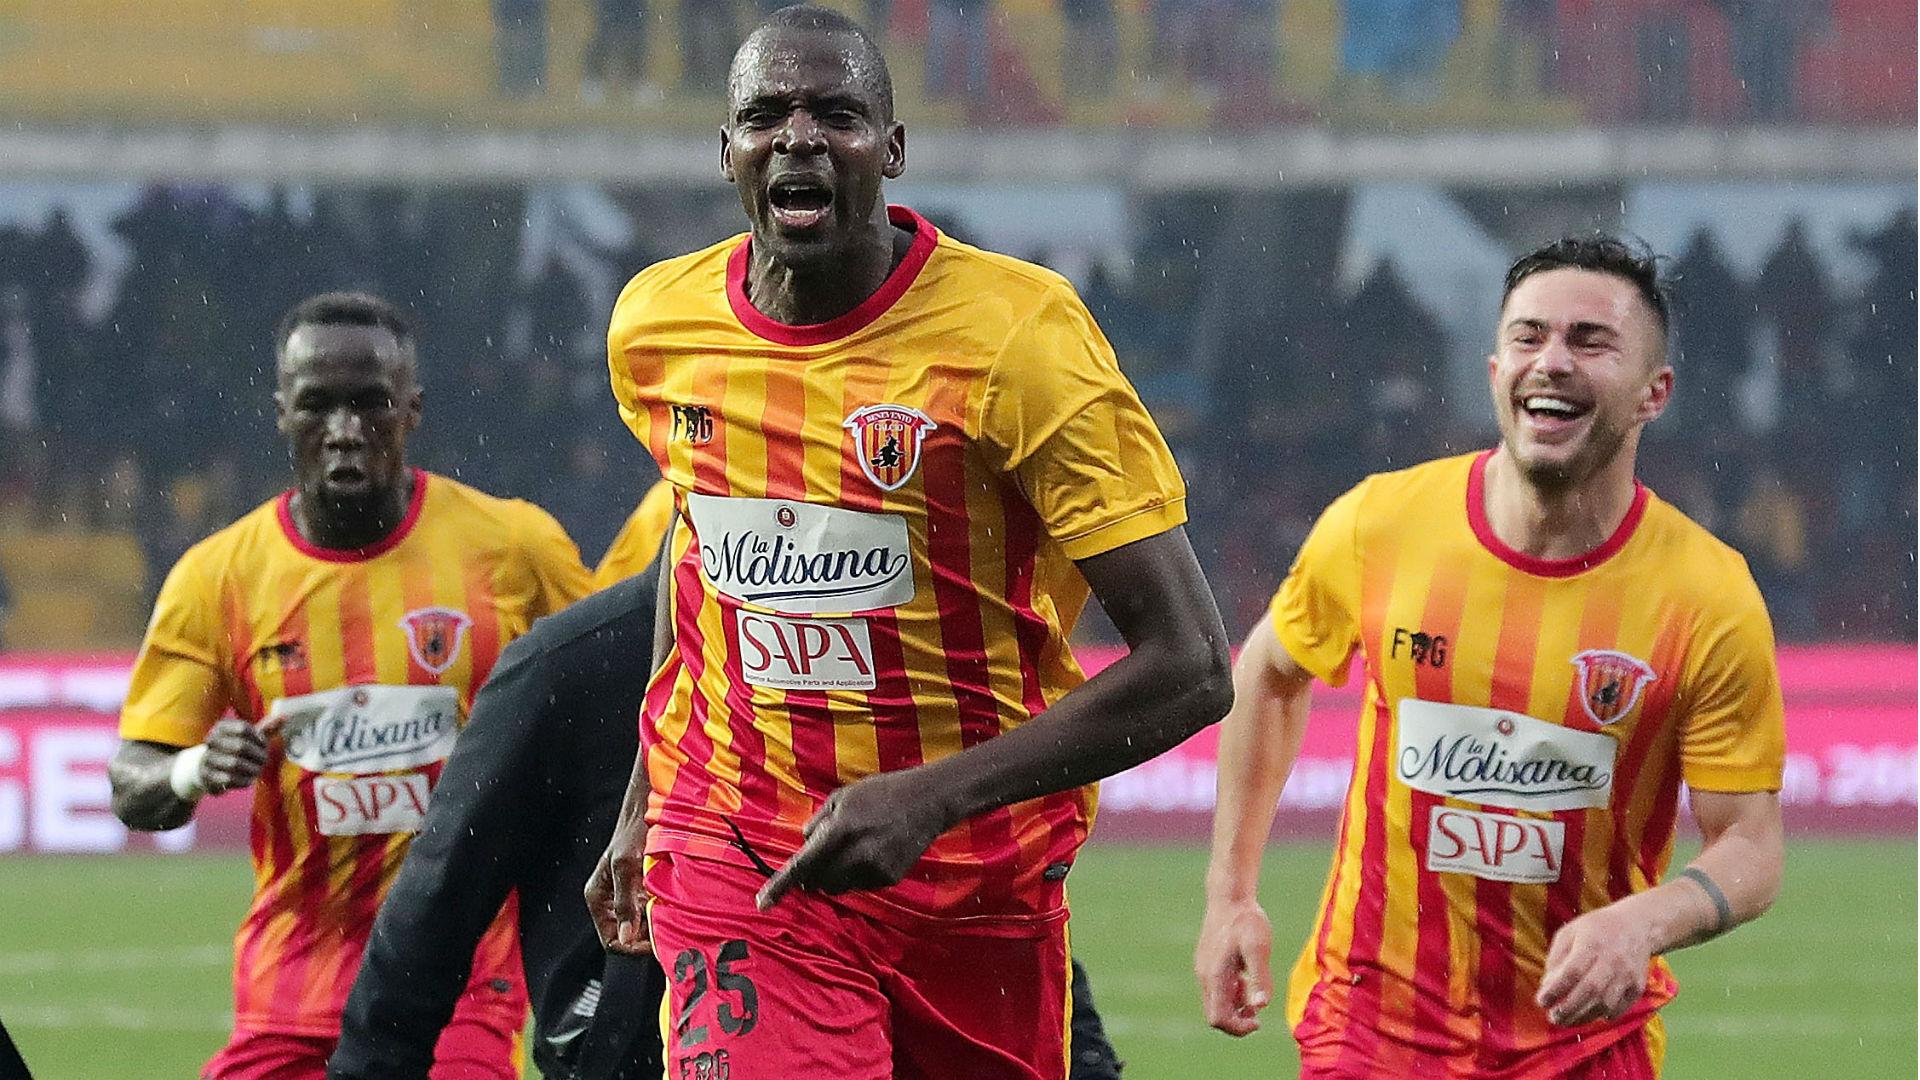 Cheick Diabate Bags Brace As Benevento Succumb To Juventus